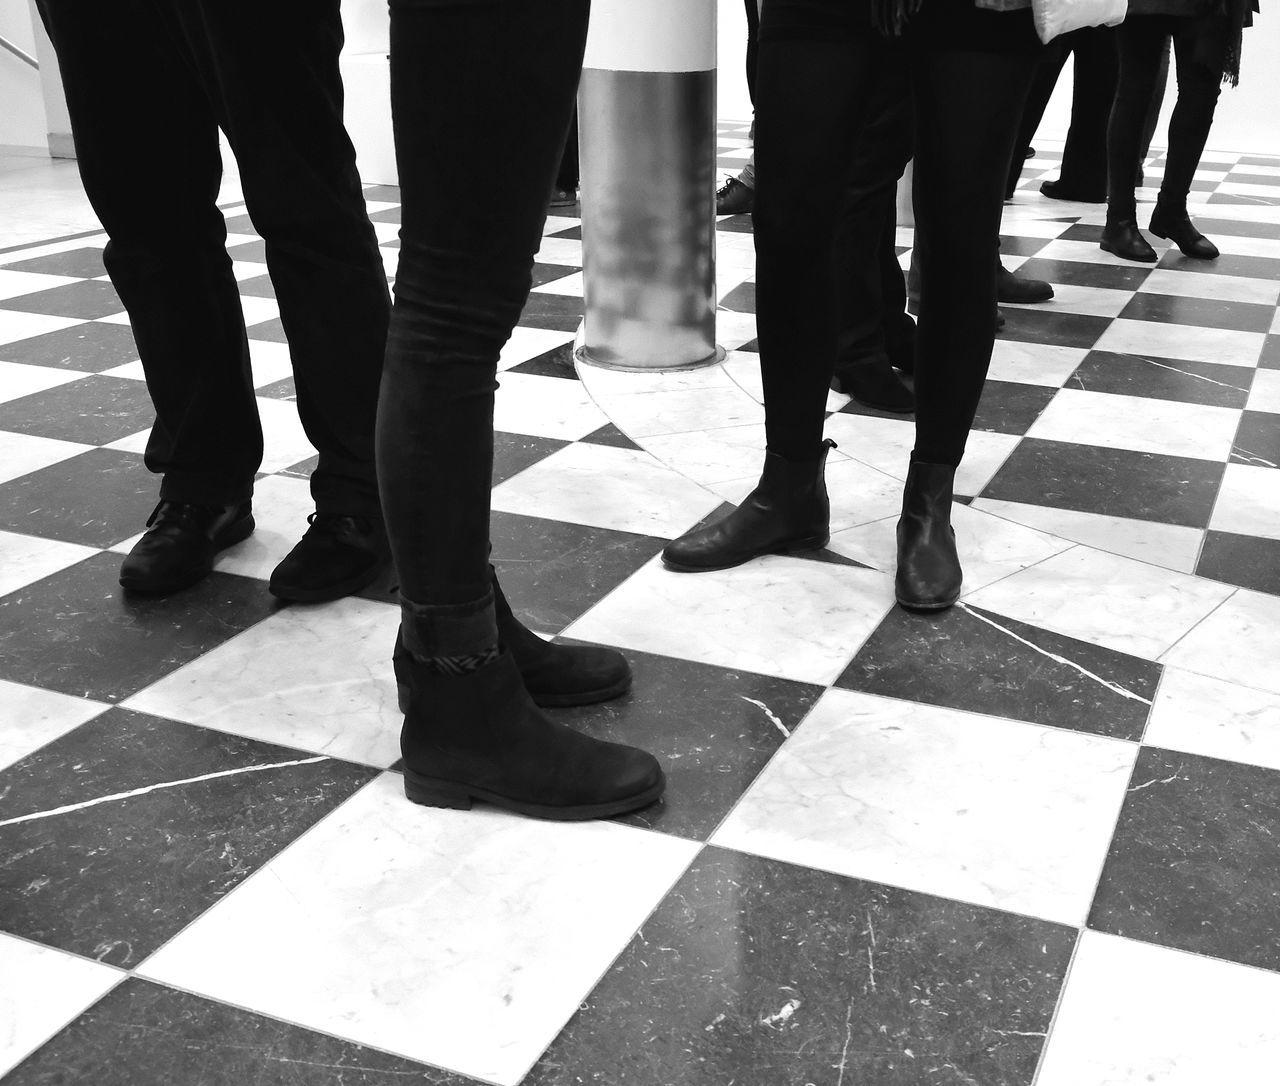 Adult Black Pants Black Shoes Blackandwhite Checkerboardpattern Day EyeEmNewHere Feet Gathering Human Human Leg Indoors  Low Section Marble Marble Floor Men People People Standing On Checkerboard Pattern Marble Floor Real People Shoes Standing Tiled Floor Togetherness Waiting Women